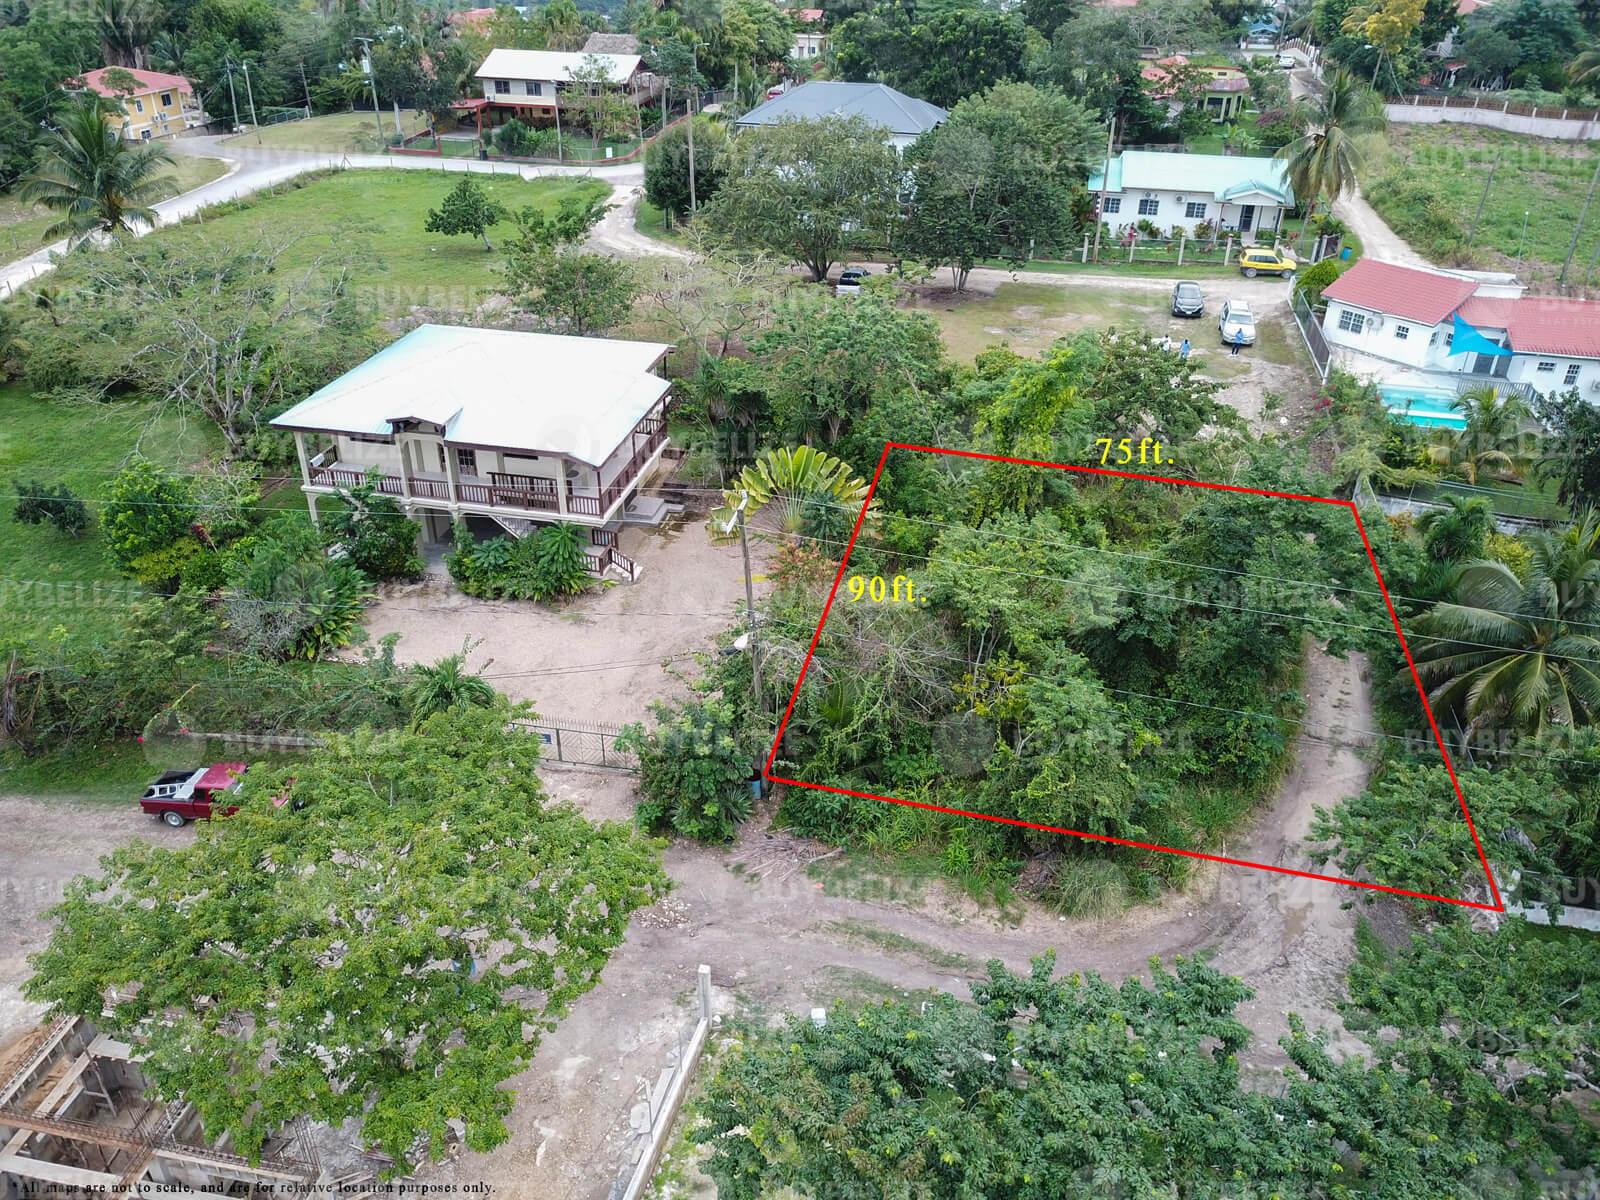 Beautiful Residential Lot for Sale in San Ignacio Town, Cayo, Belize